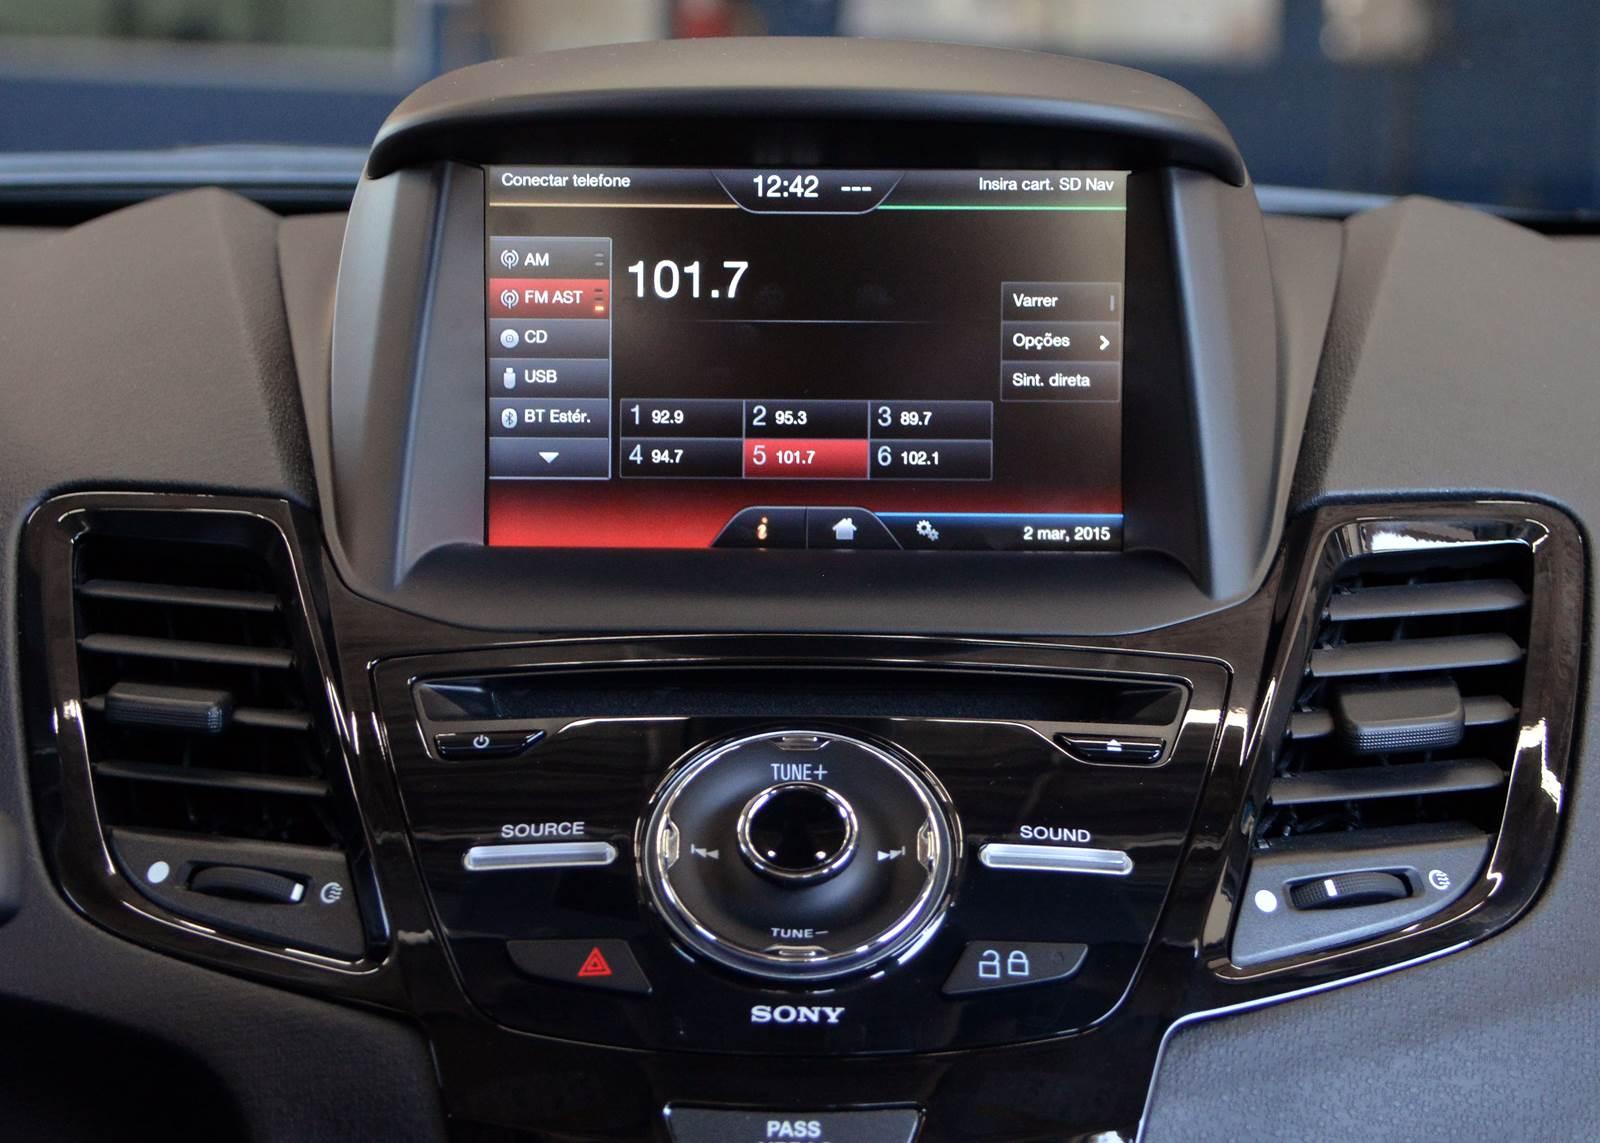 Ford New Fiesta Sedan Titanium Plus 2015 - GPS